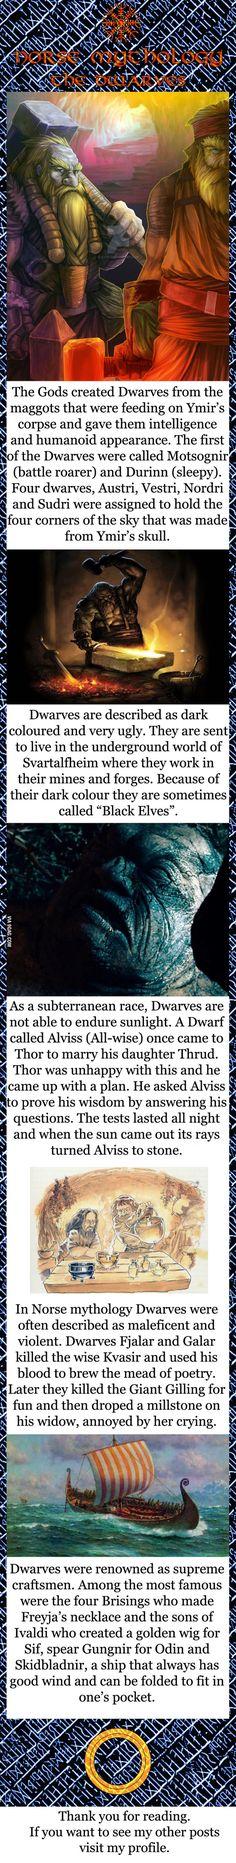 Norse mythology - The Dwarves